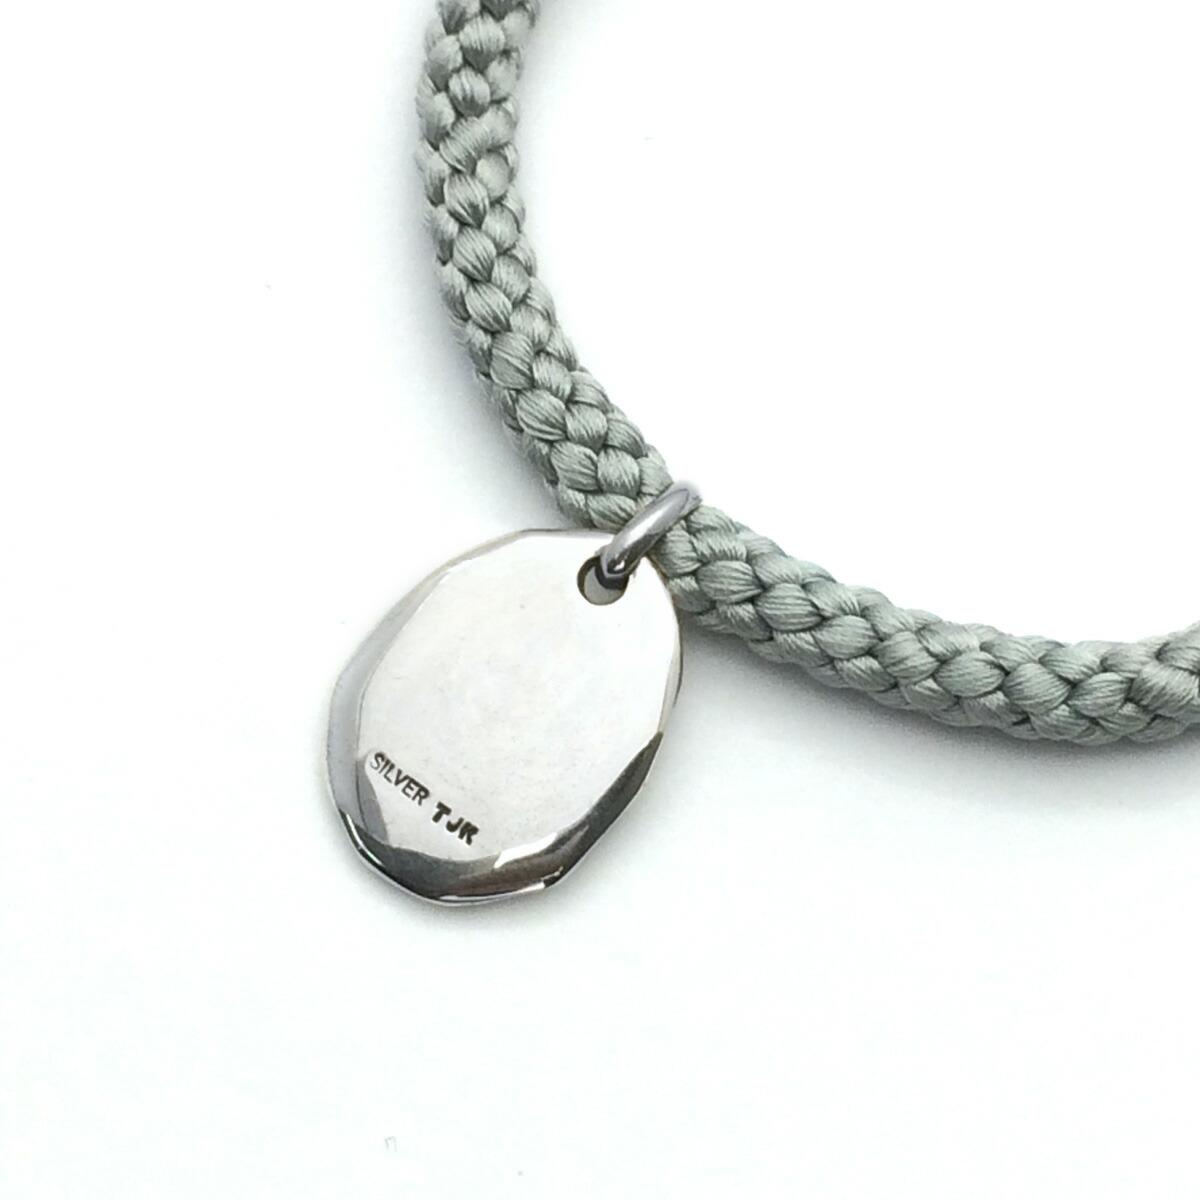 Protection Sanskrit characters braid bracelet talisman against evil lucky  charm OLKB03-BON Olive is original